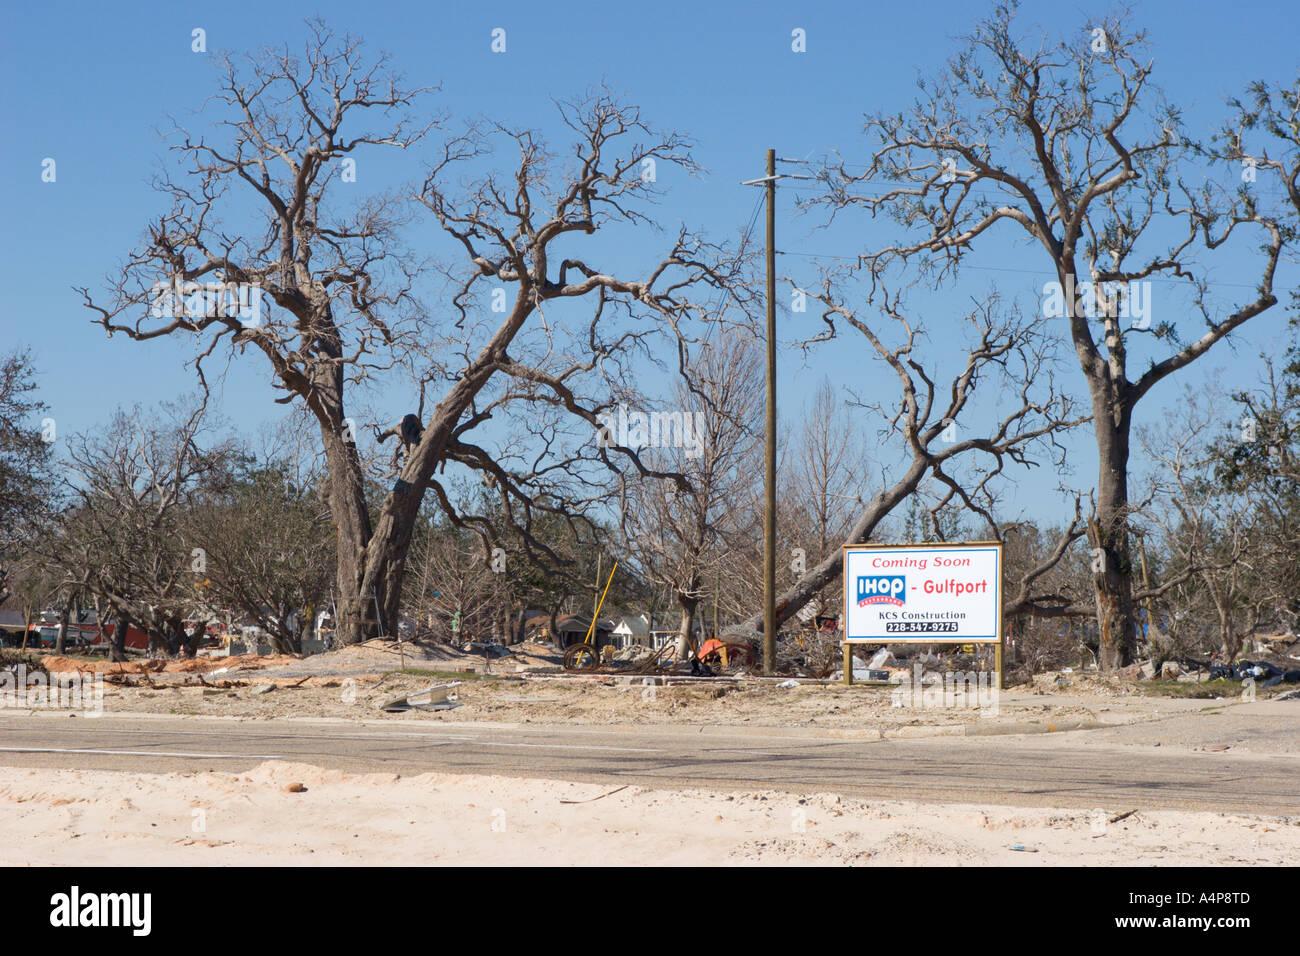 Reconstruction Site For Ihop Restaurant To Rebuild After Hurricane ...